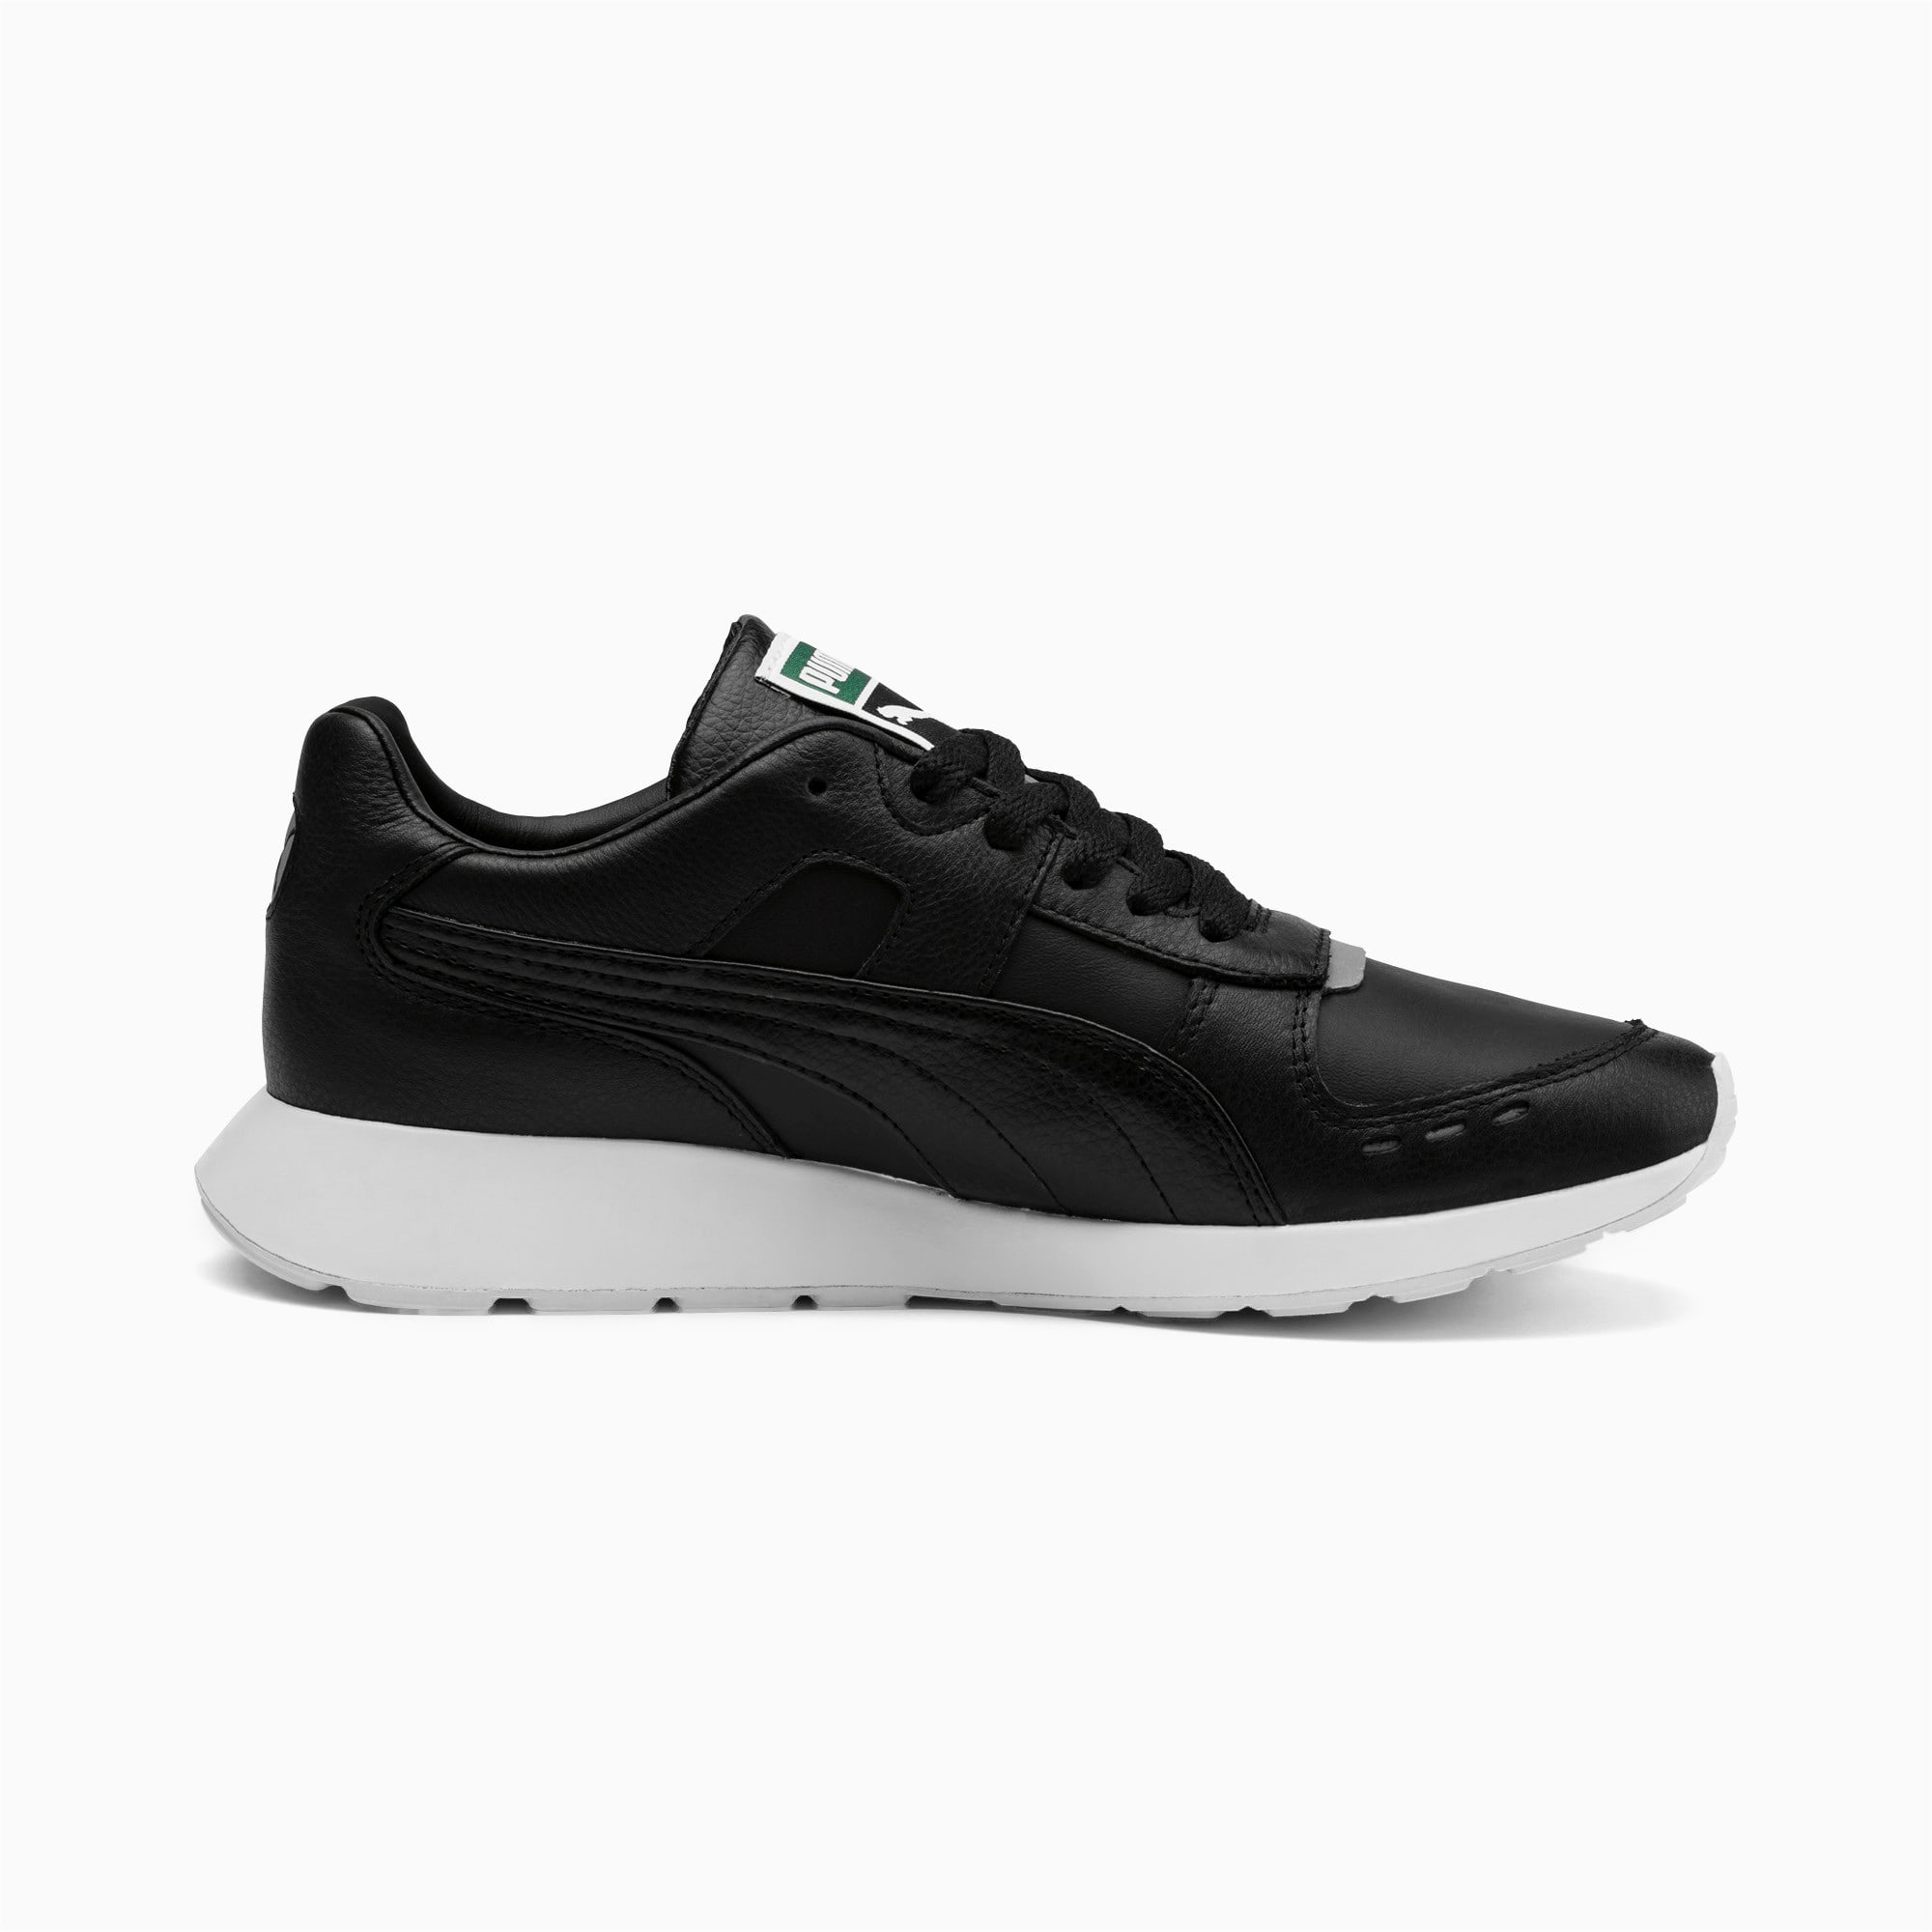 Thumbnail 6 of RS-150 Women's Sneakers, Puma Black-Puma Black, medium